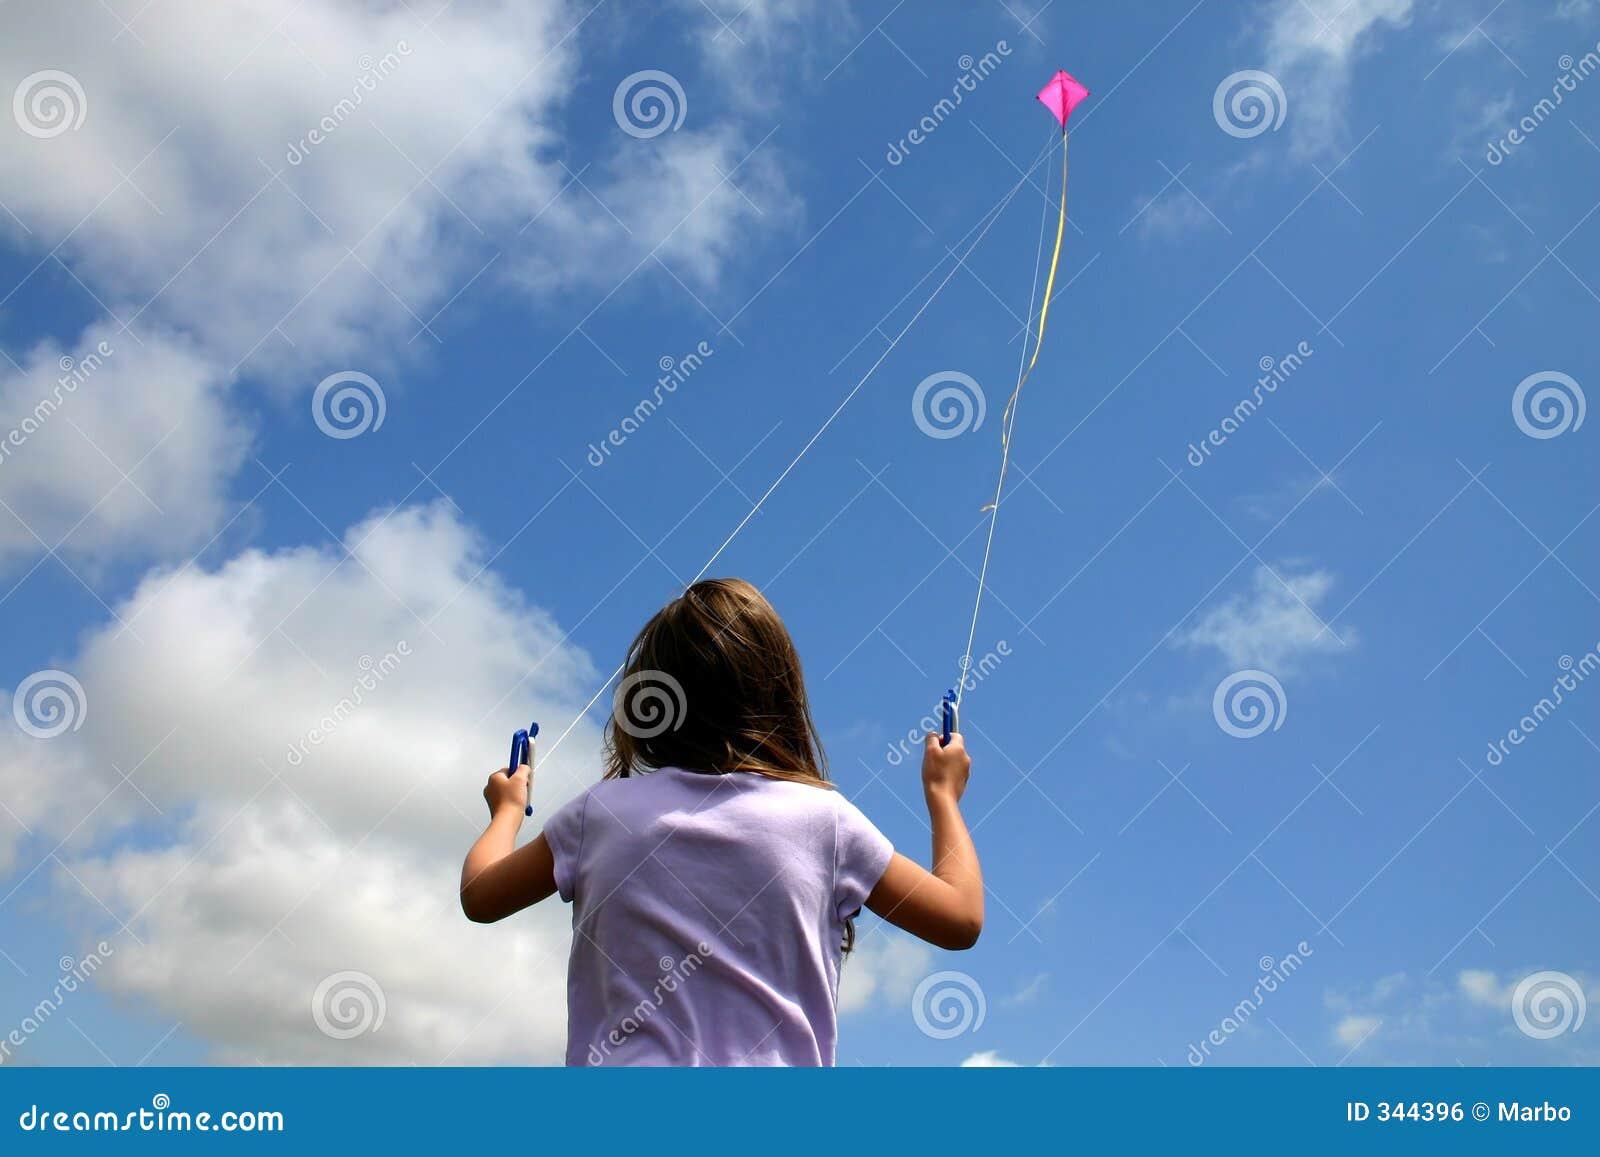 Drachenflugwesen